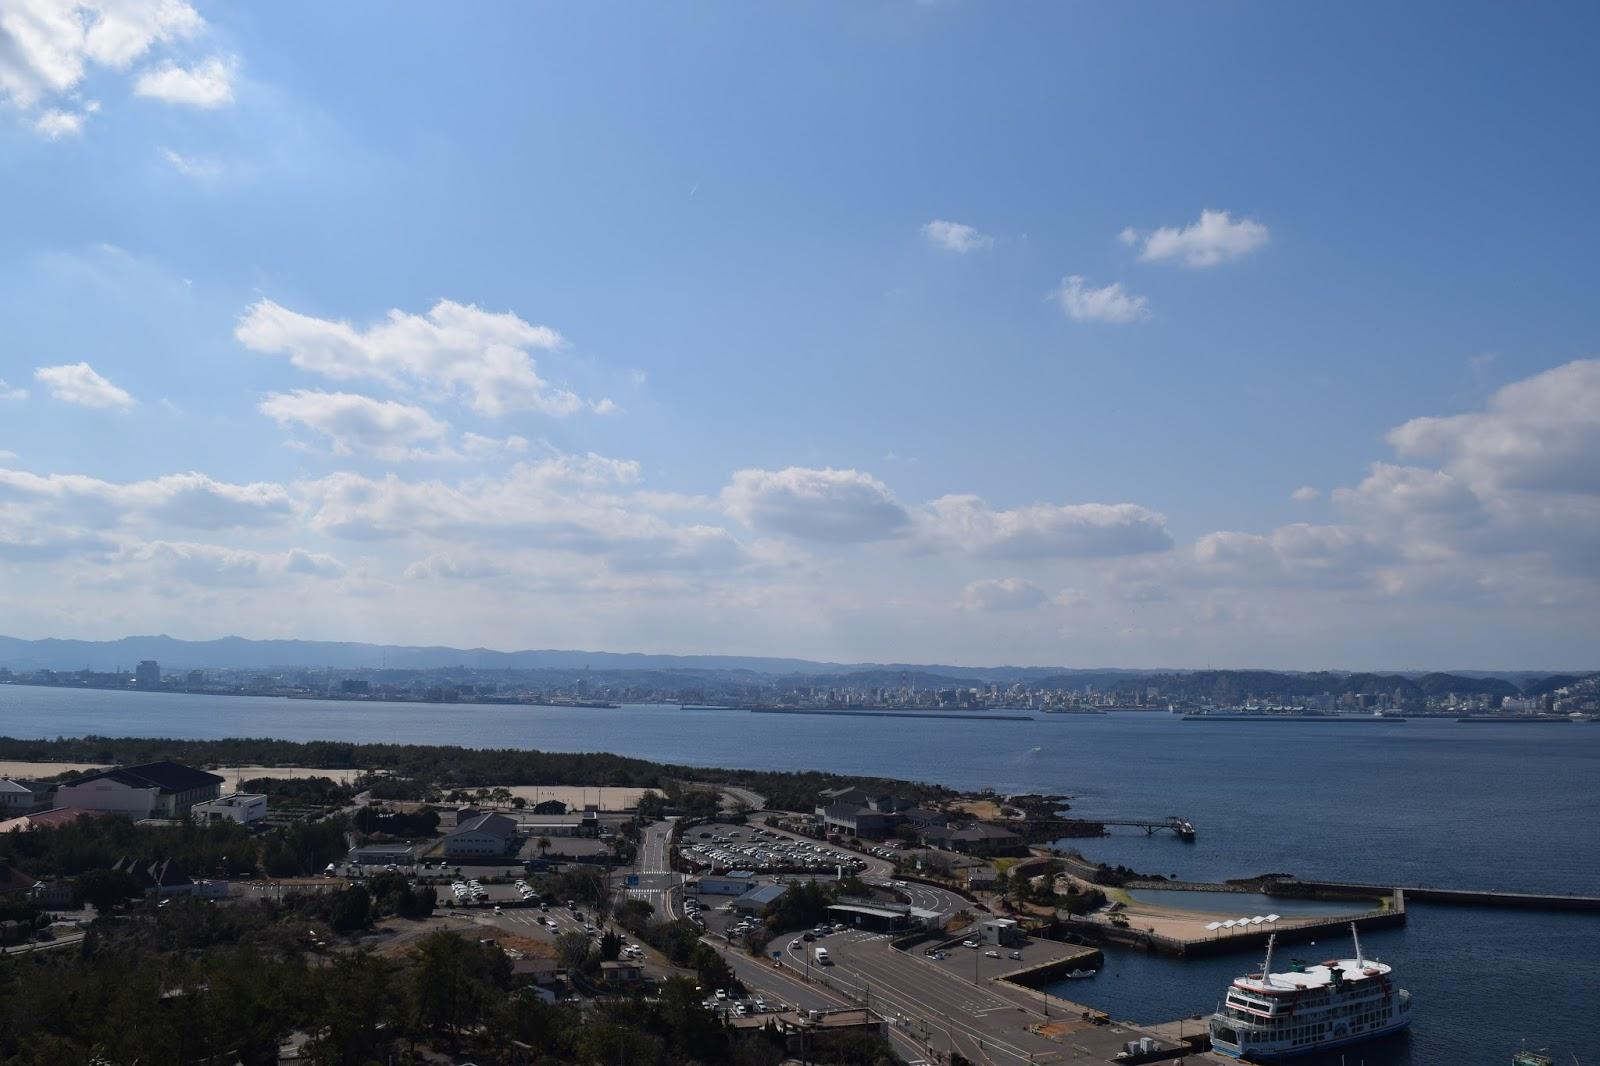 View of Kagoshima from Sakurajima